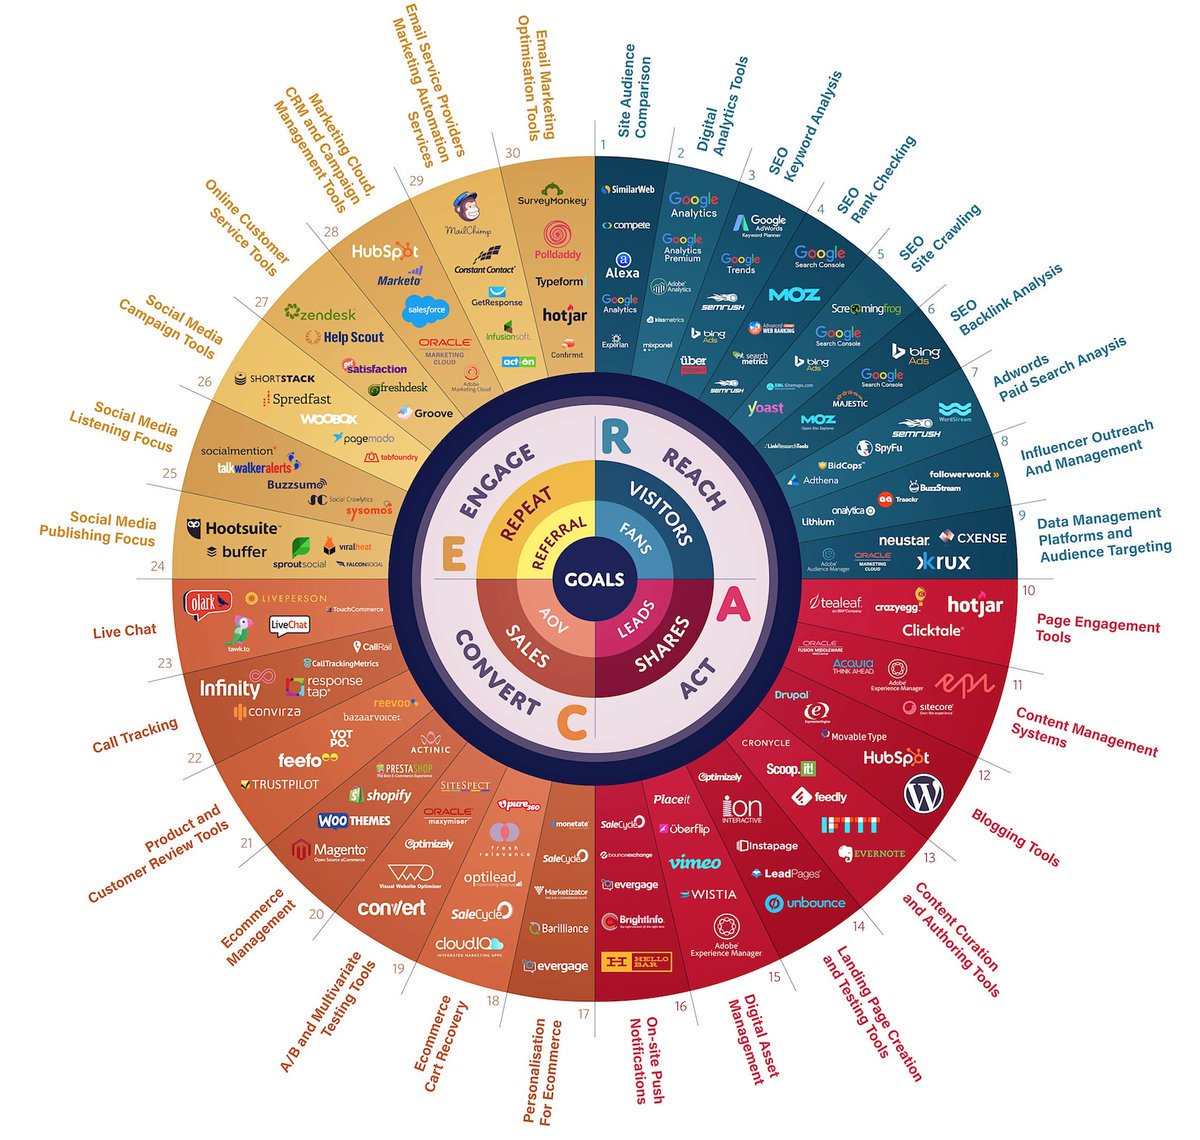 Digital Marketing Tools for Customer reach, Lead generation, Sales and Engagement requirements.  #InternetMarketing #SEO #OnlineMarketing #EmailMarketing #marketing #DigitalMarketing #socialmedia #InboundMarketing #GrowthHacking #SMM #sem #ContentMarketing #Engagement https://t.co/PfiZYntyAT